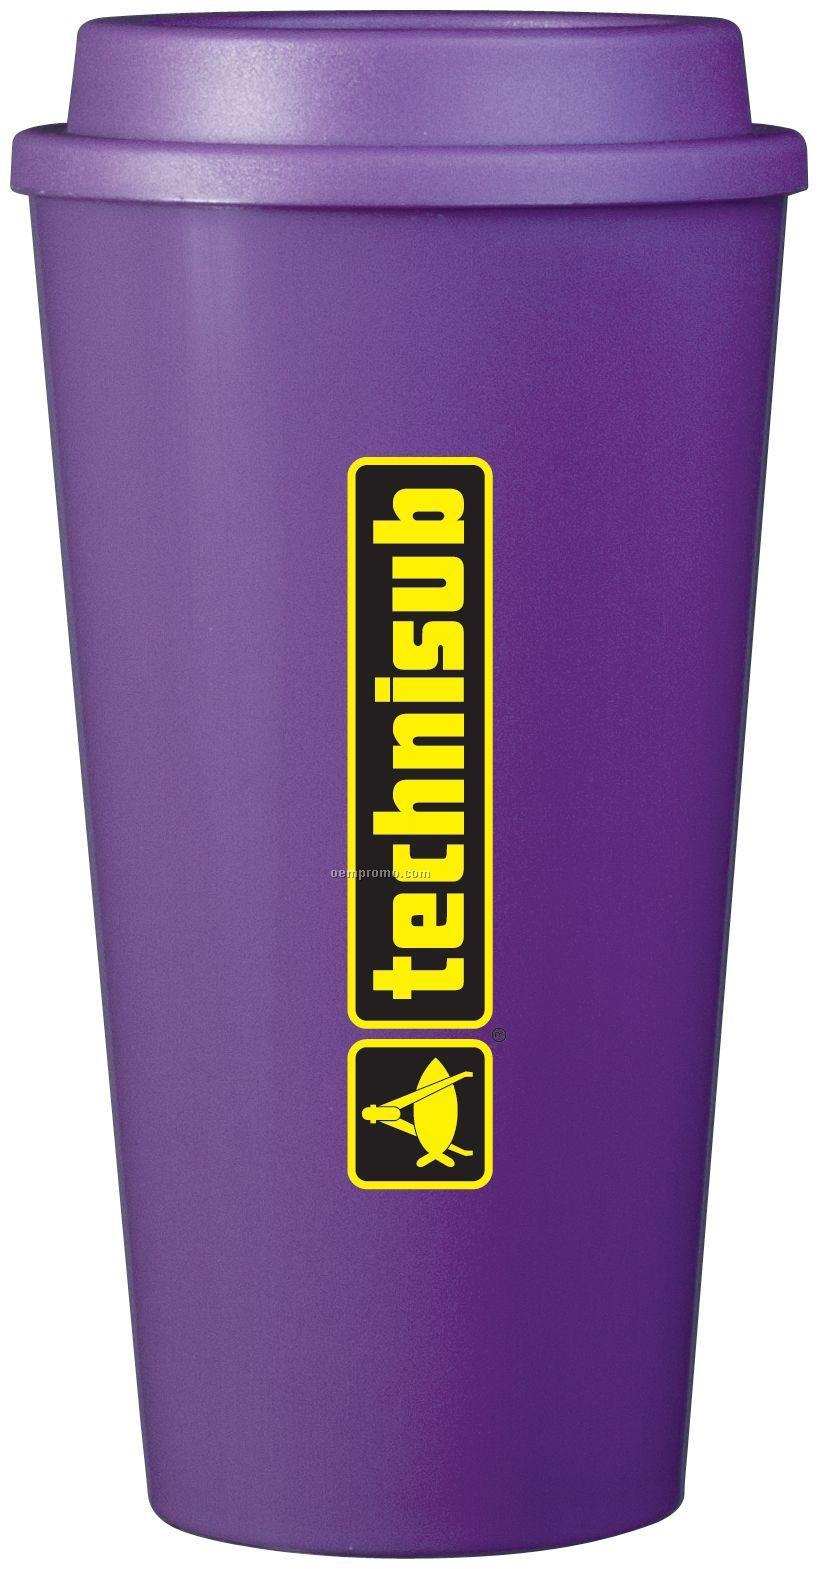 16 Oz. Purple Plastic Cup2go Cup